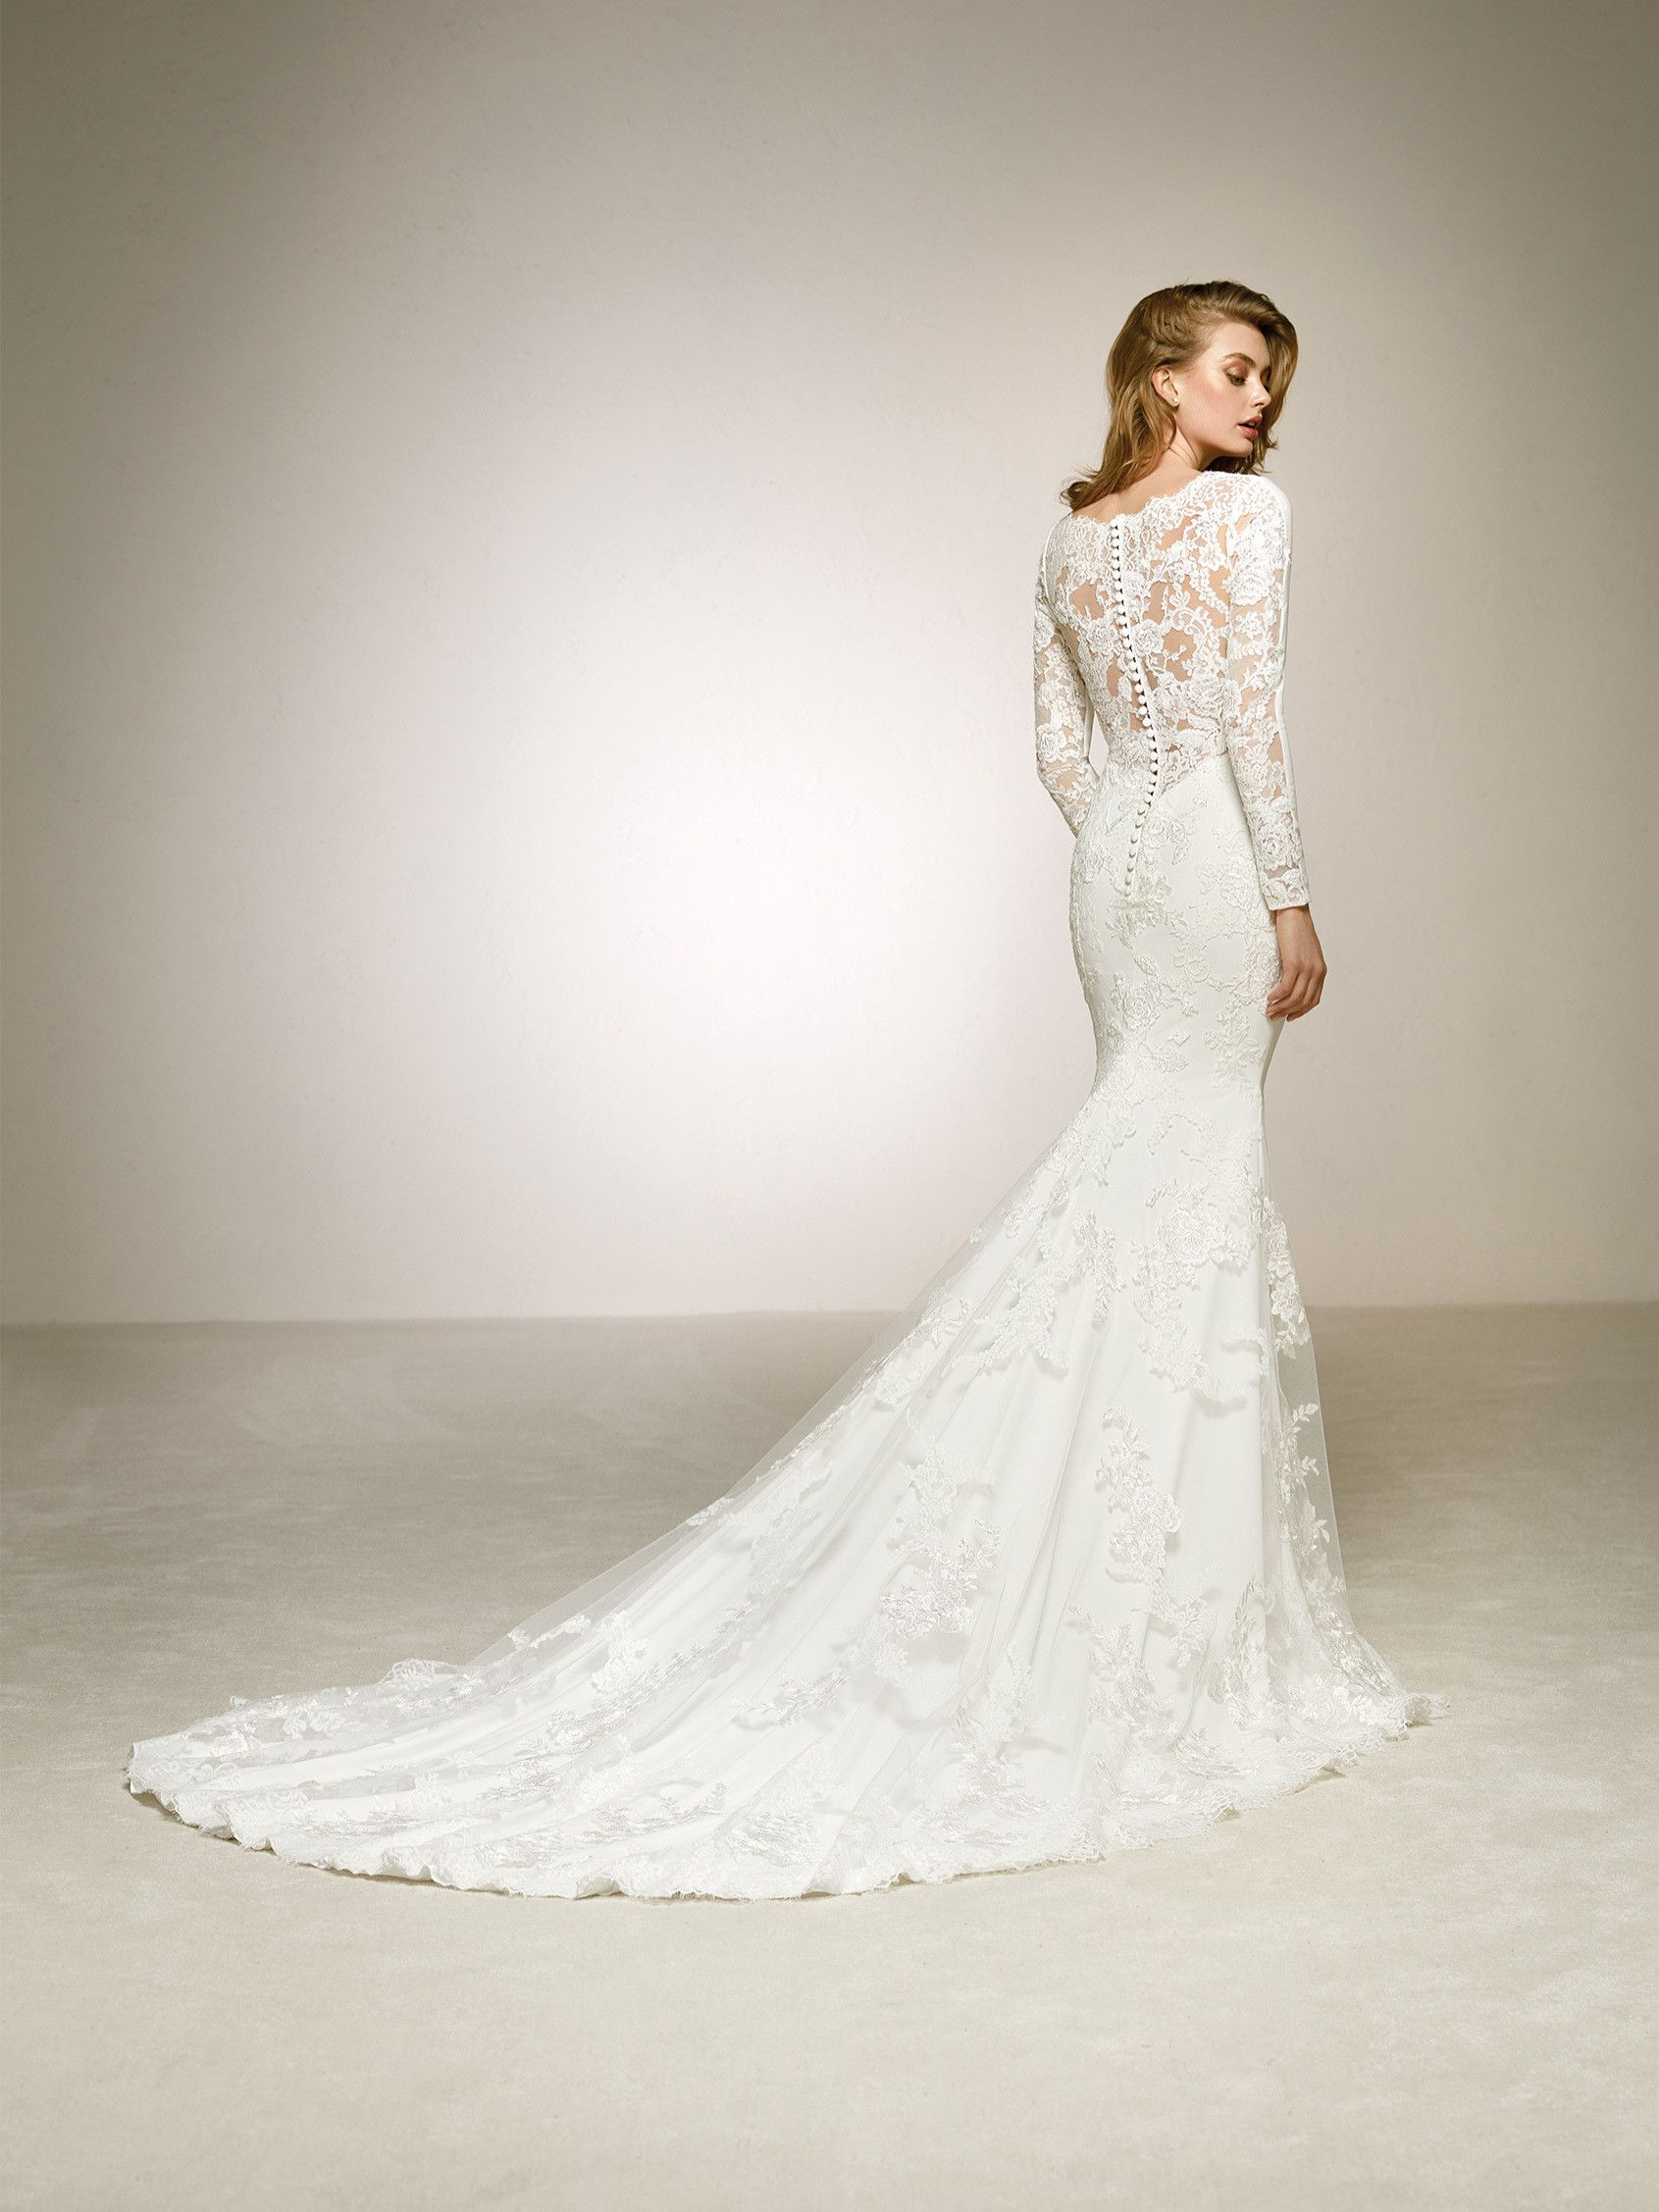 0a200a33fc30 wedding dress lace sleeves and illusions PRONOVIAS DAKOTA